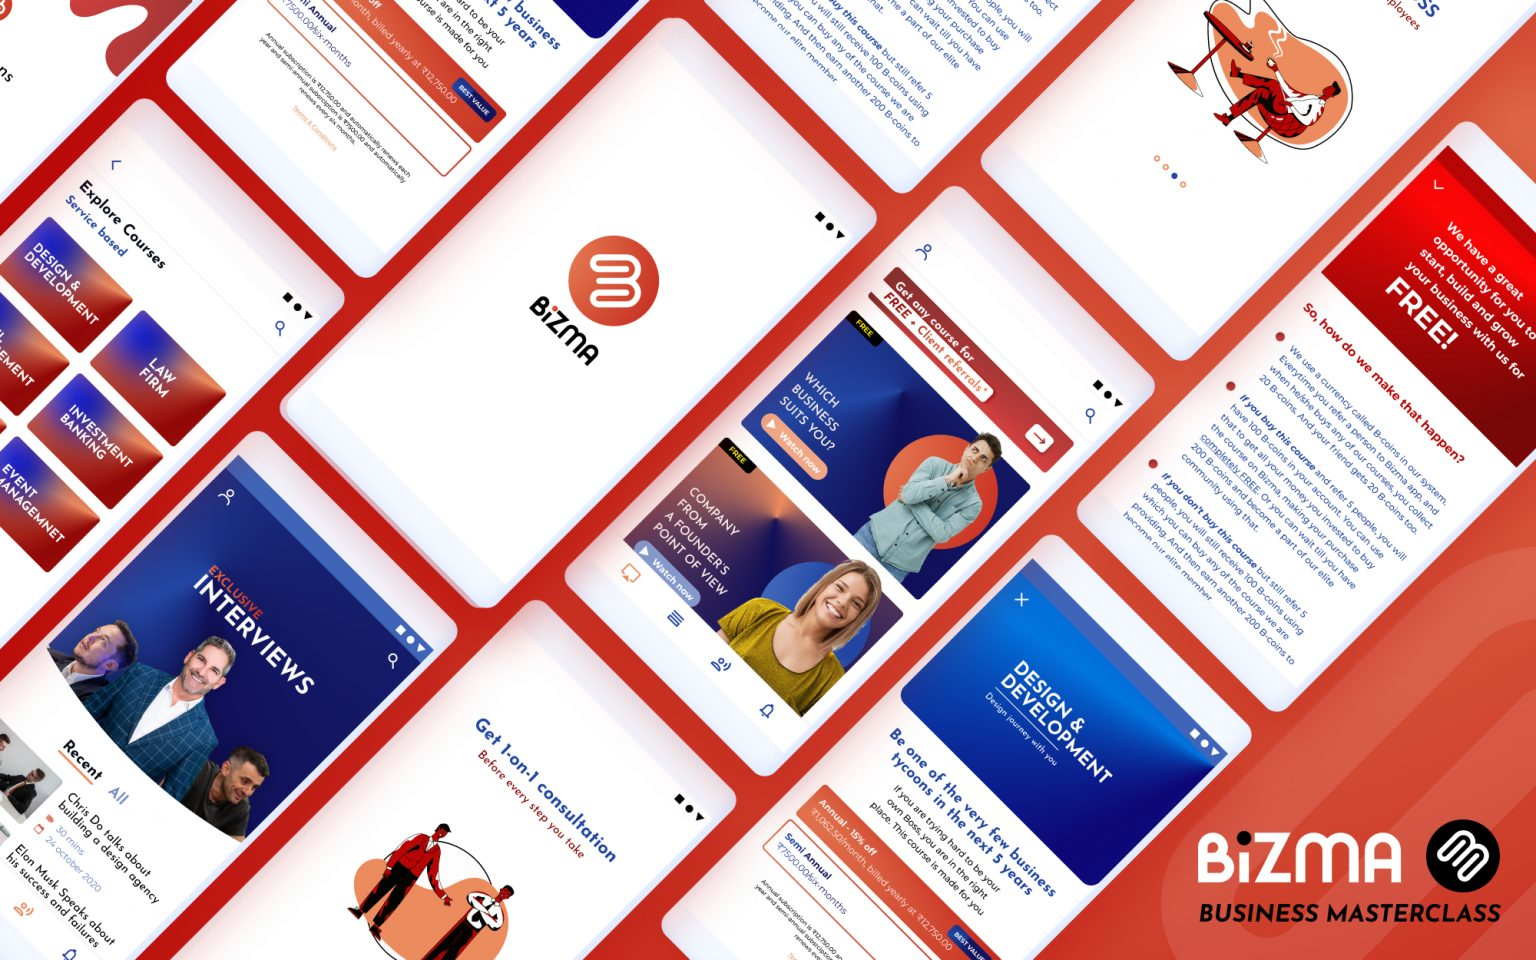 App design for a business masterclass app